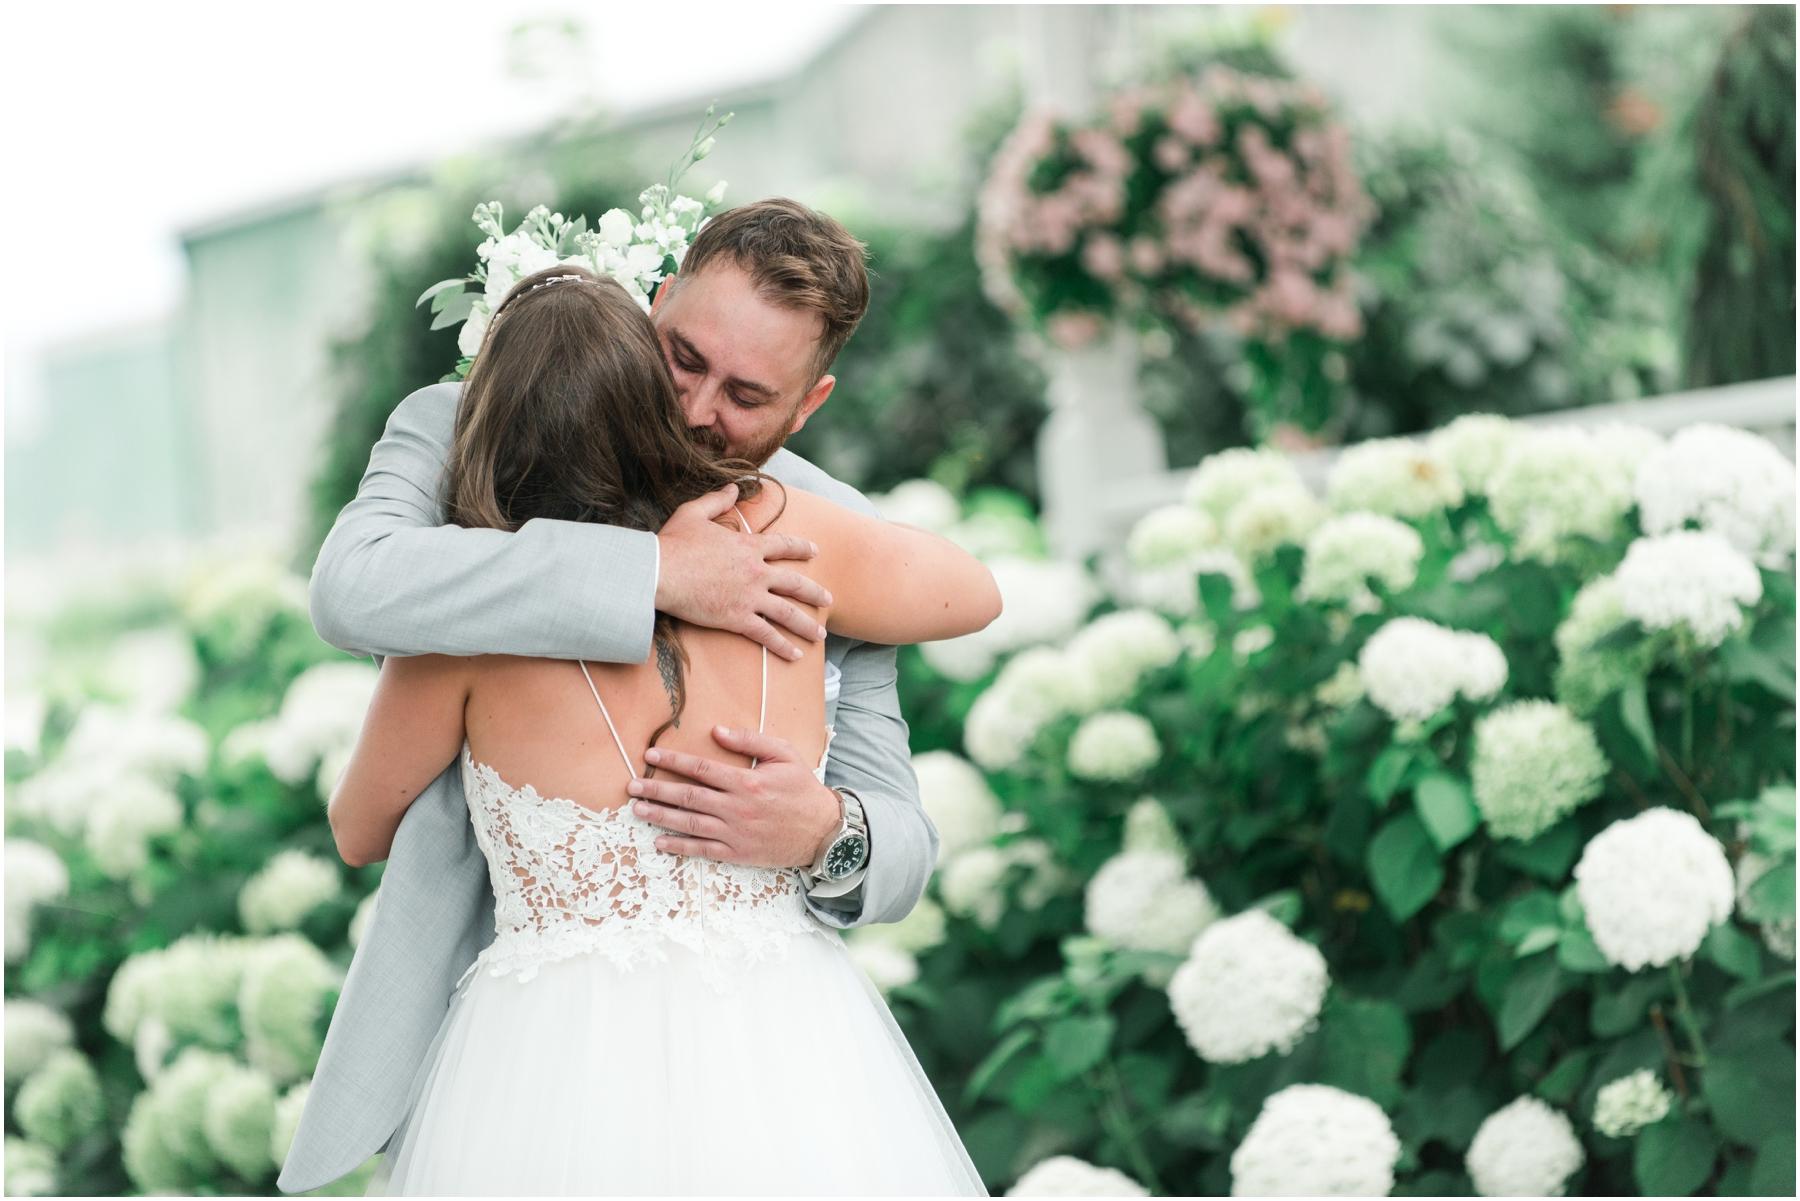 Bloom Field Gardens Wedding Precious Photography_0327